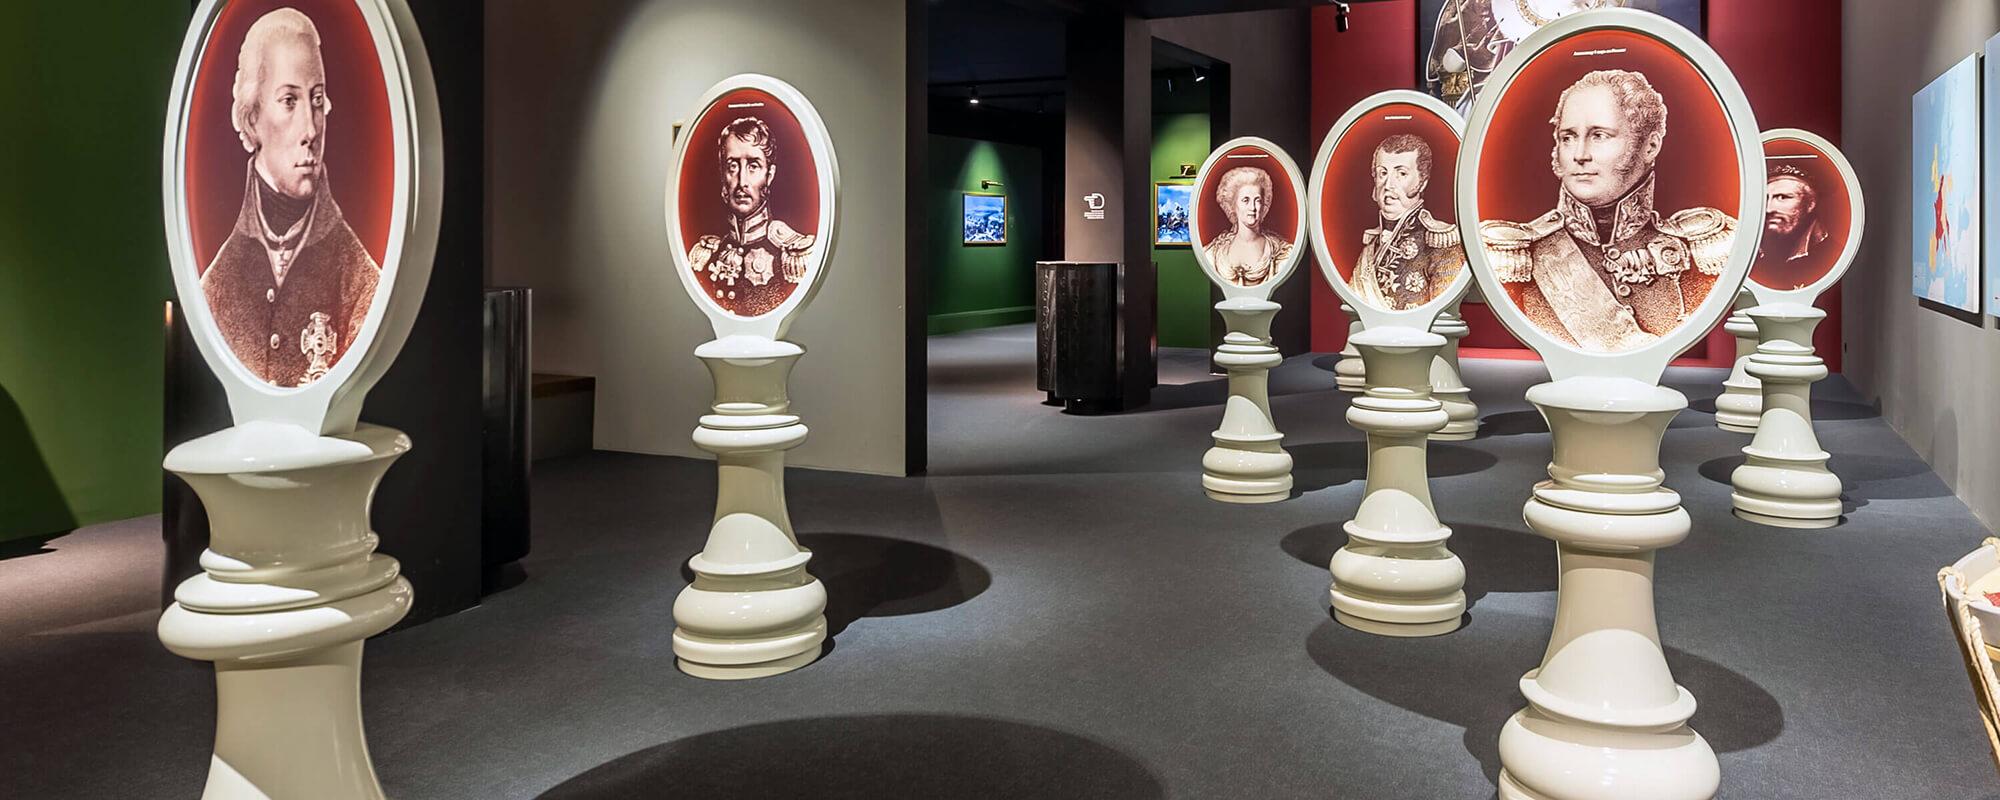 Musée Mémorial Waterloo 1815 salle des portraits